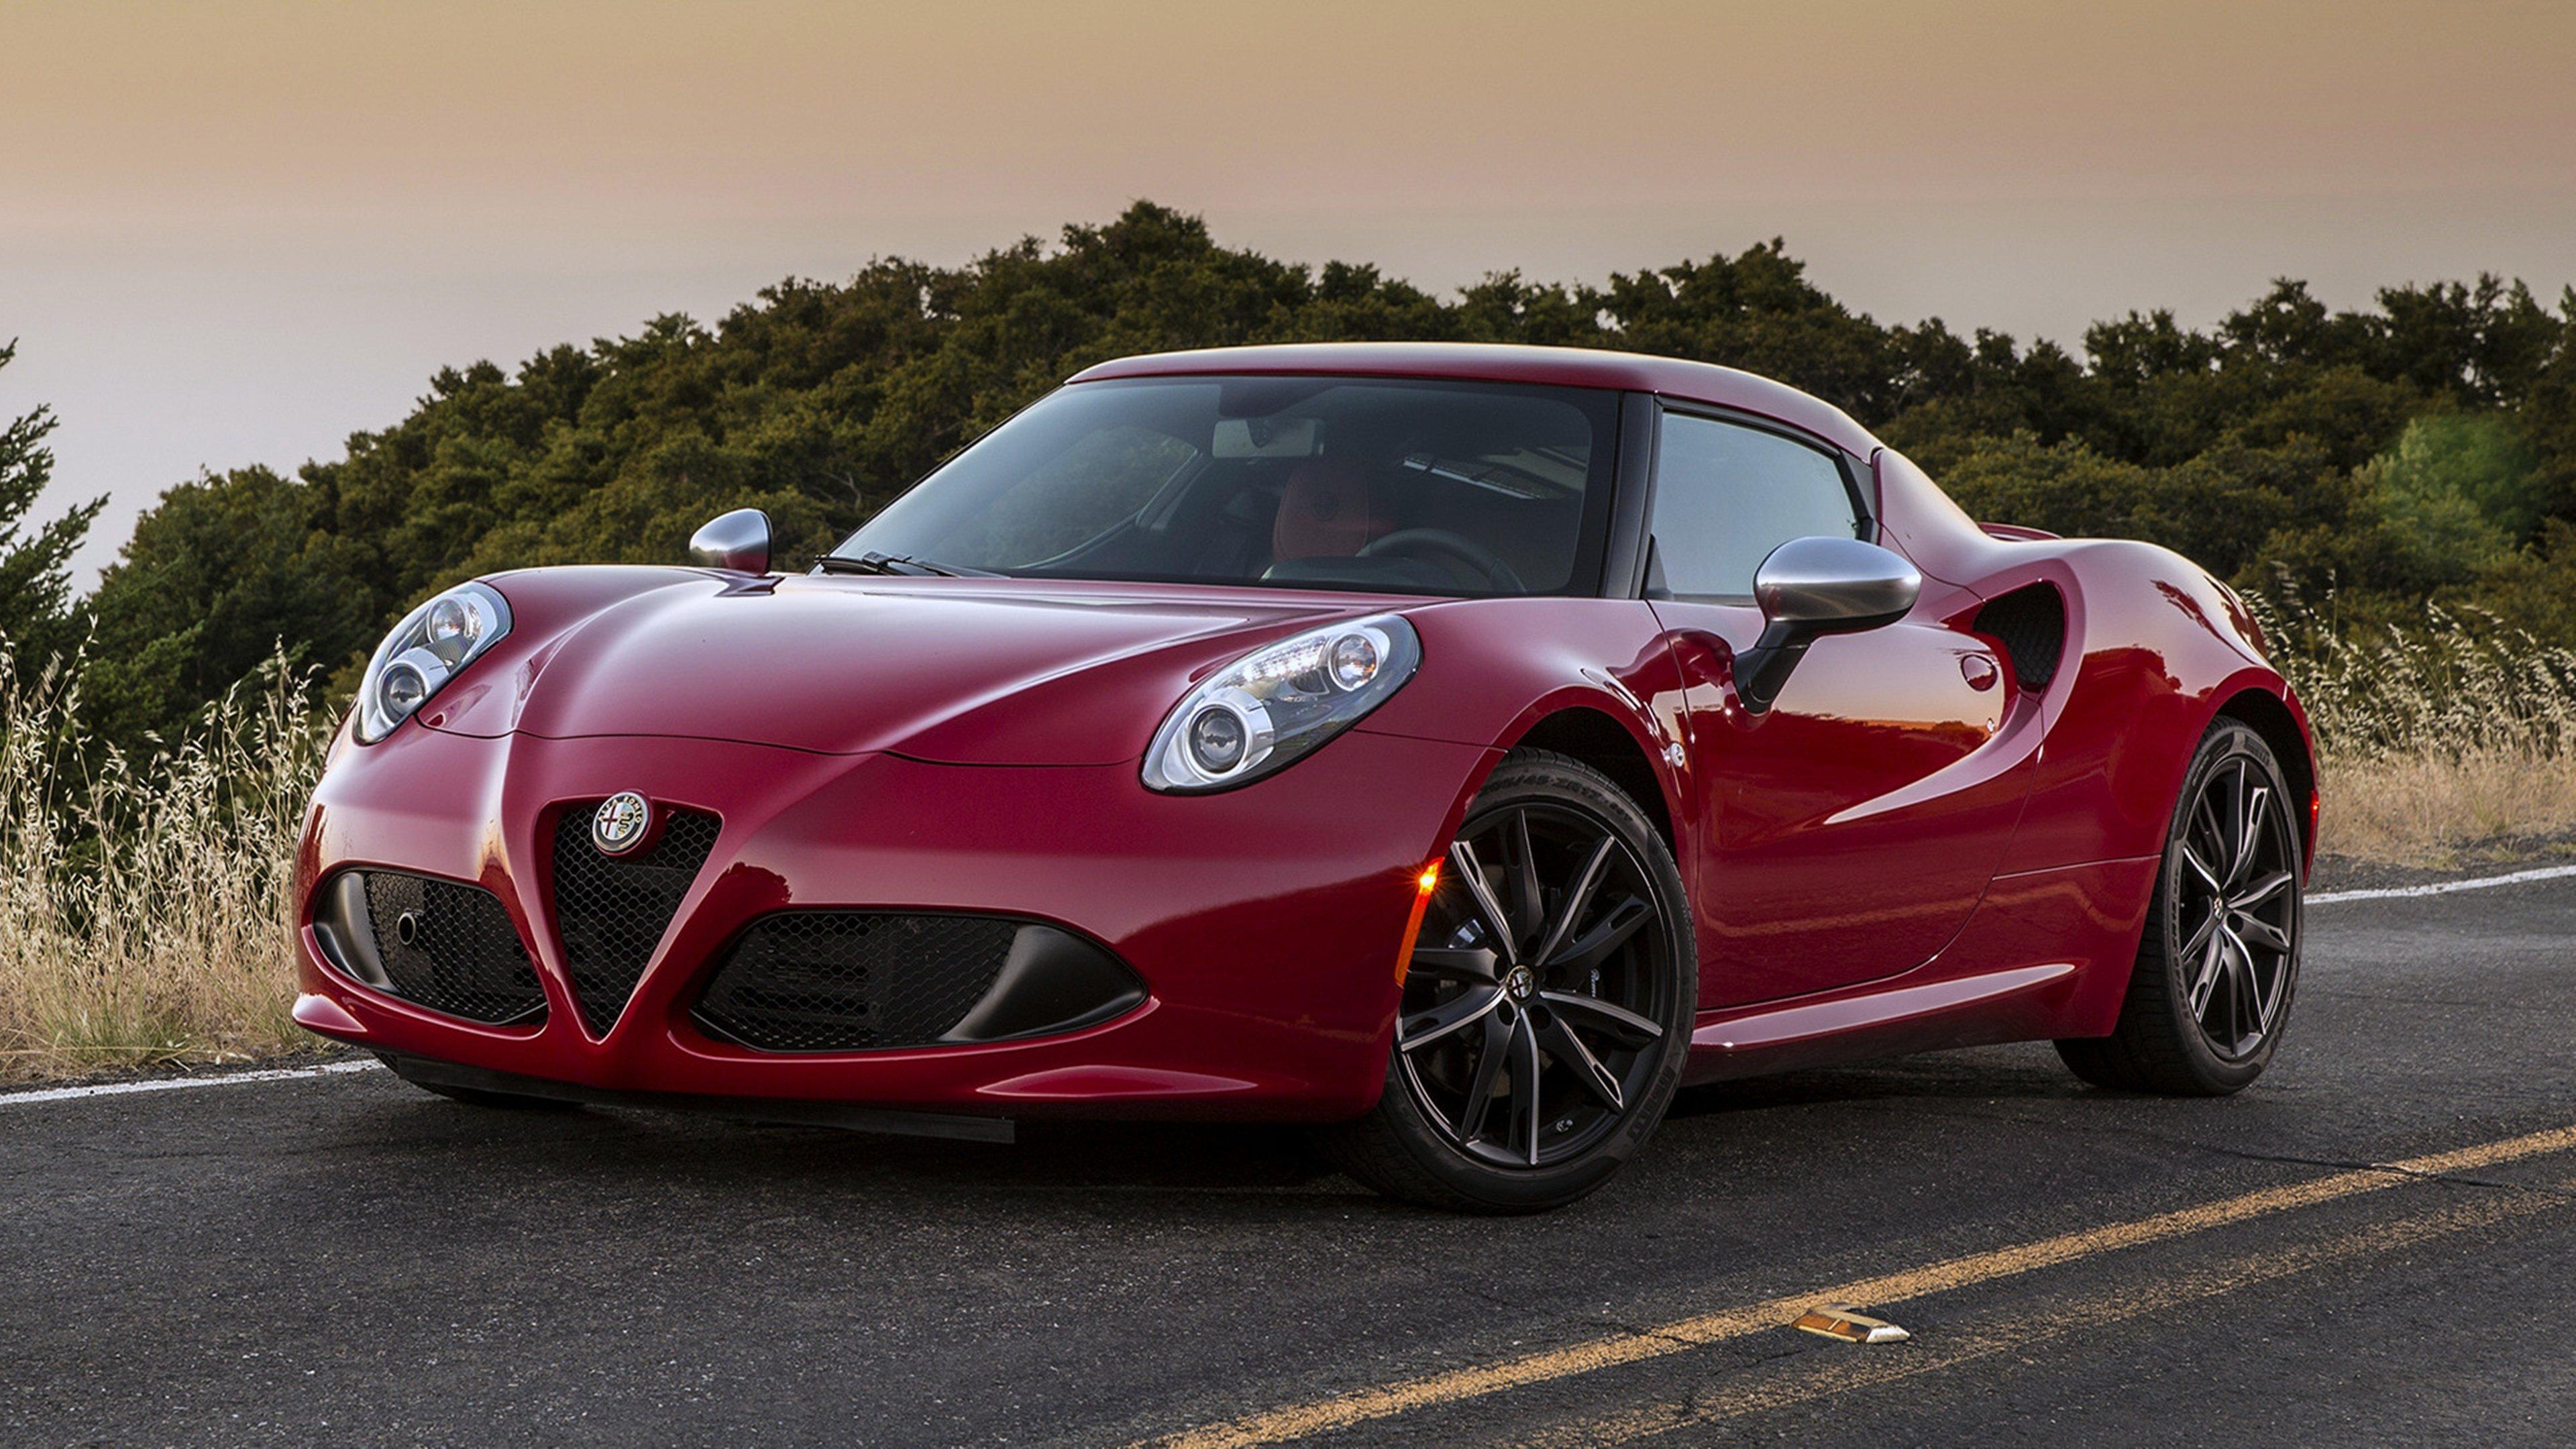 Alfa Romeo 4c Wallpapers Hd For Desktop Backgrounds